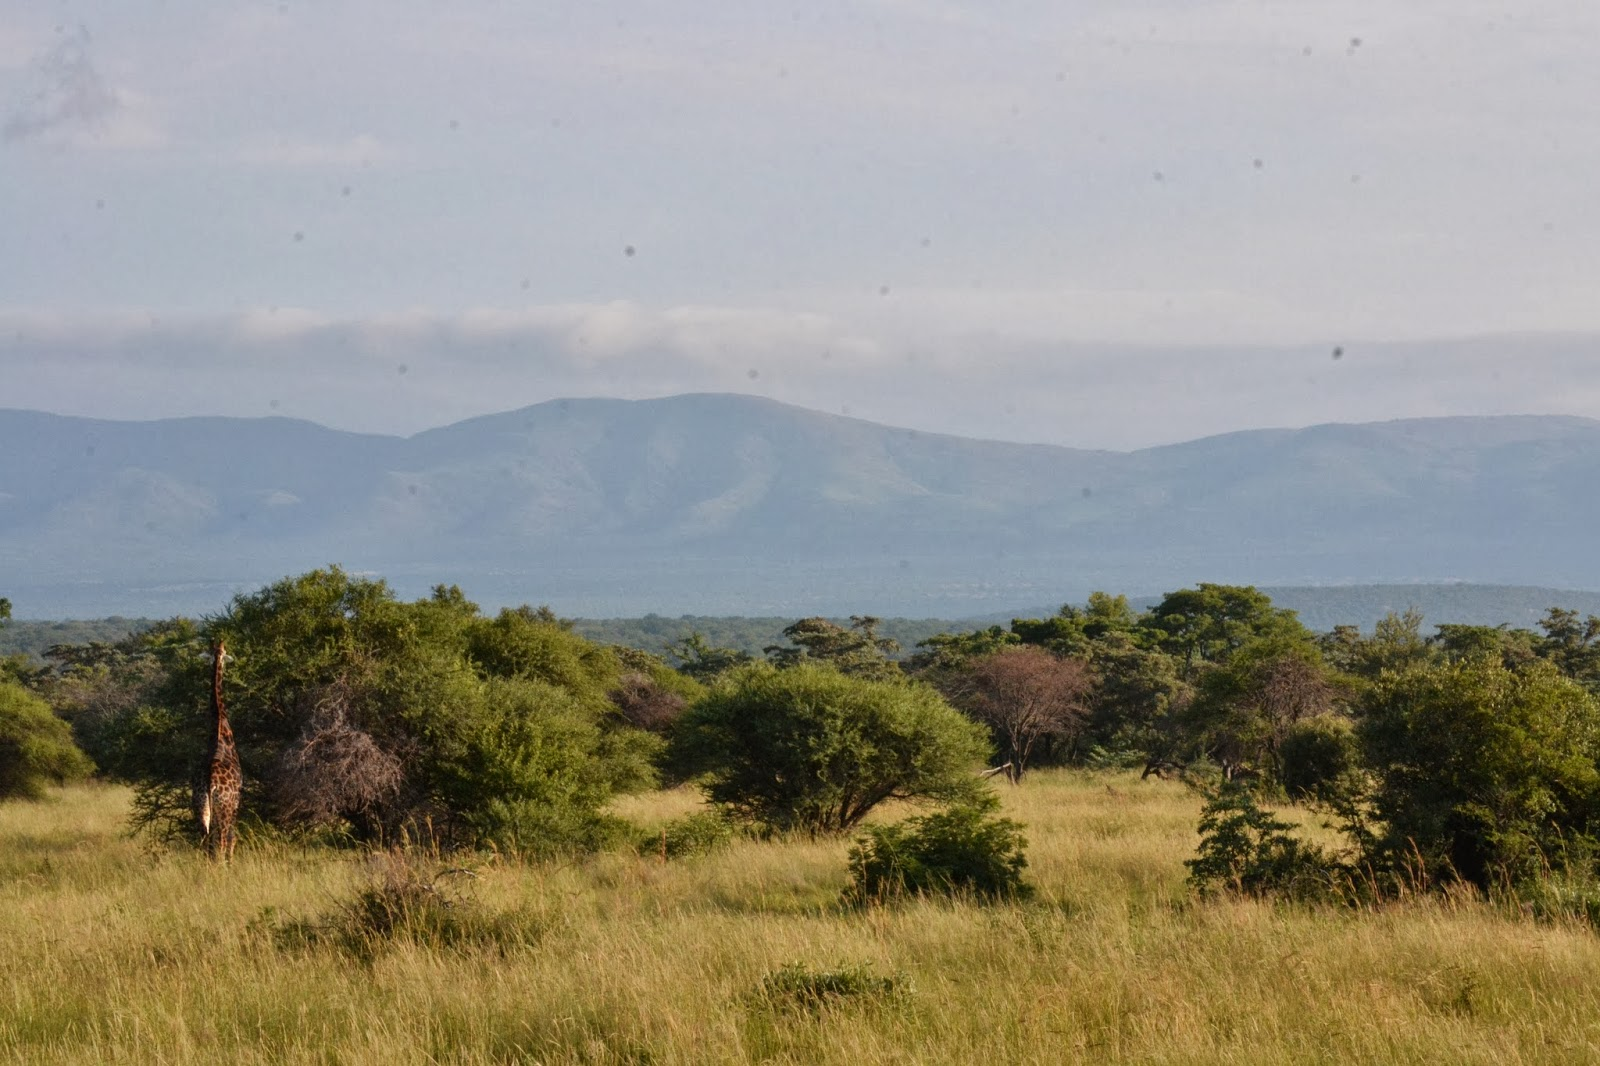 Giraffe at base of mountain